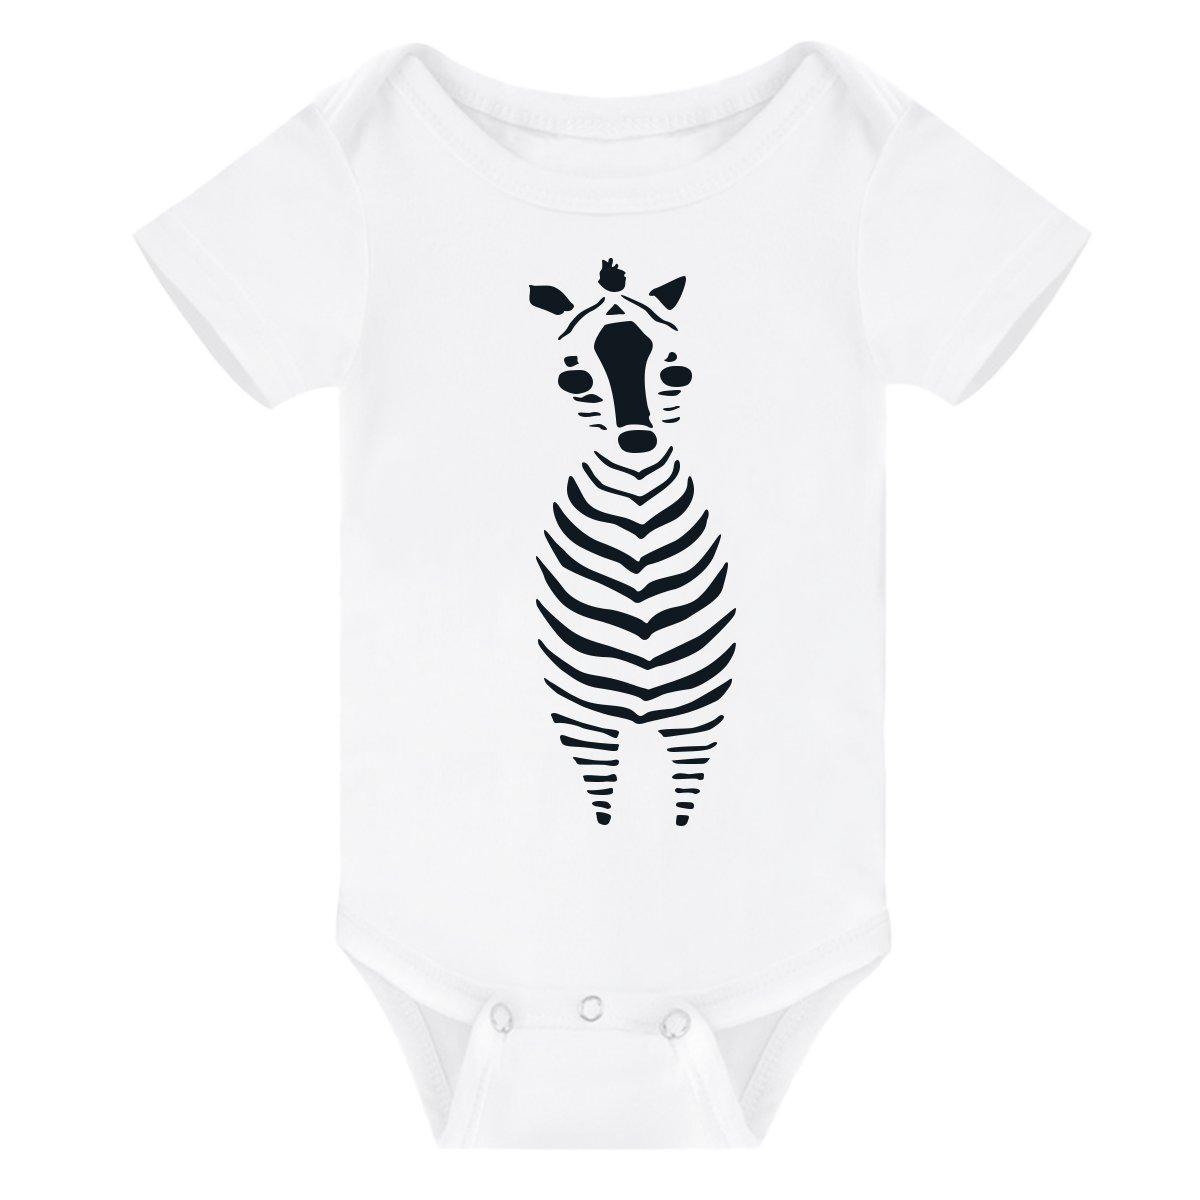 8fbbb596bd74 Amazon.com  WINZIK Newborn Infant Baby Boys Girls Outfits Cute ...